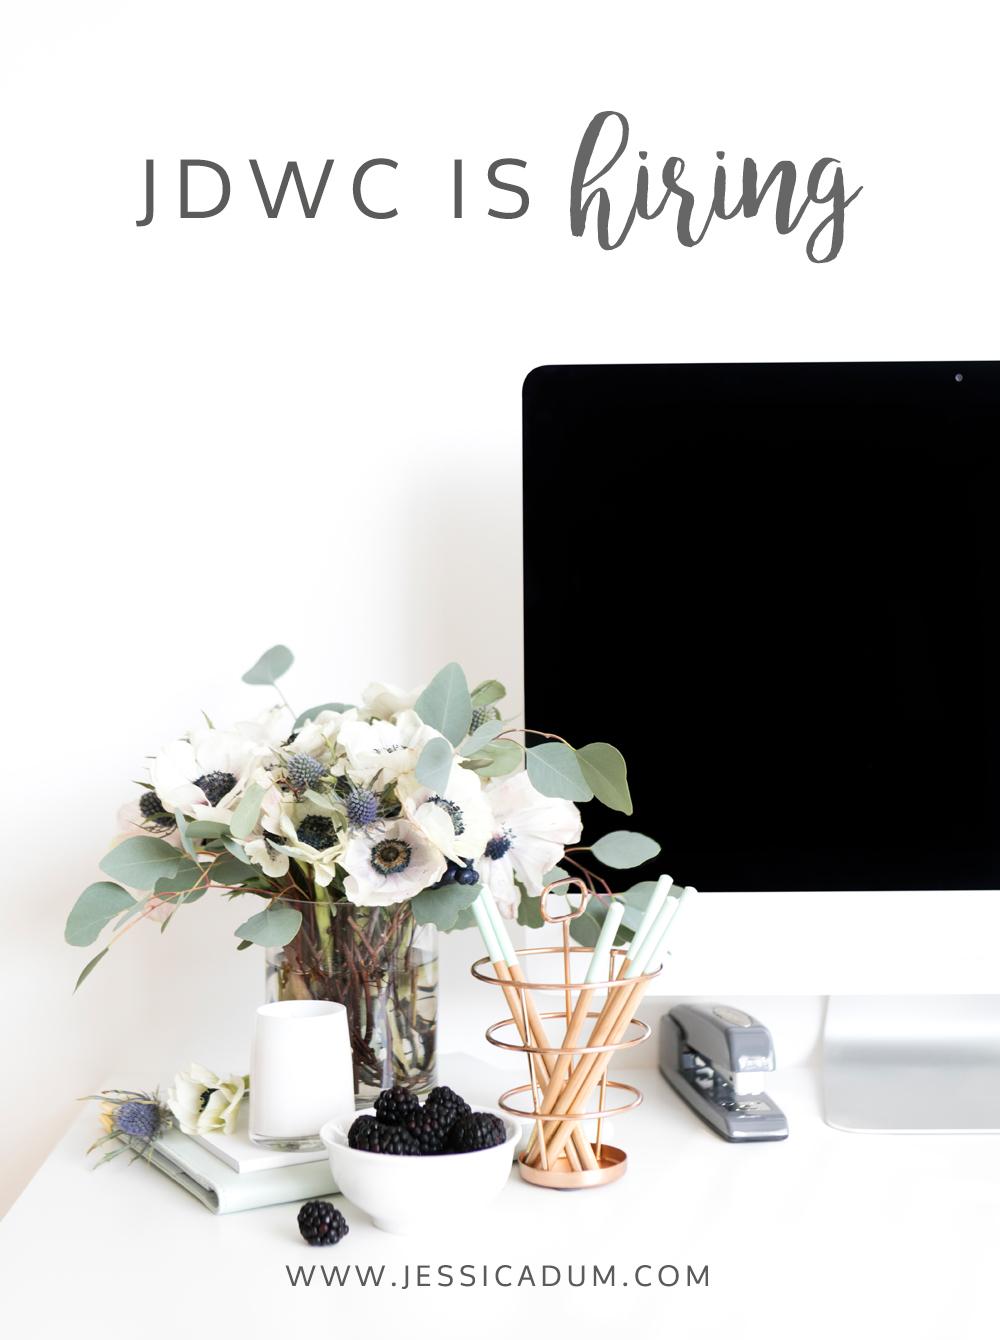 Jessica Dum Wedding Coordination is hiring | http://bit.ly/2fNUzn4